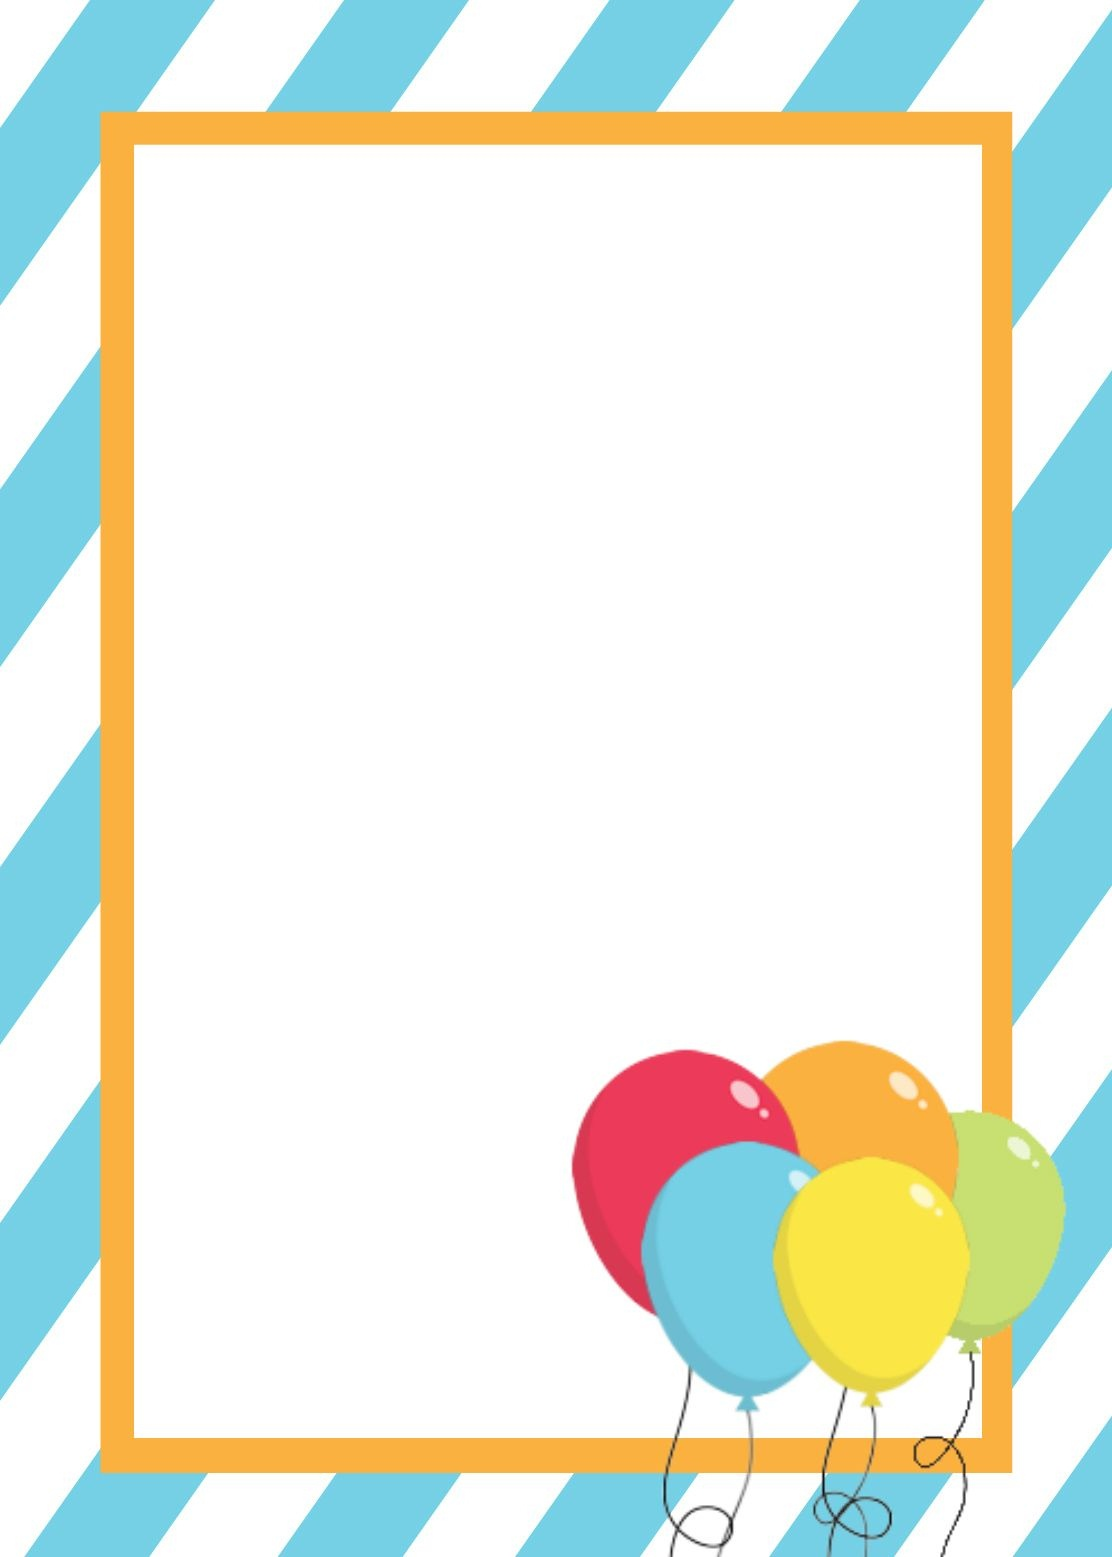 Free Printable Birthday Invitation Templates | Birthday Ideas And - Free Printable Blank Birthday Coupons